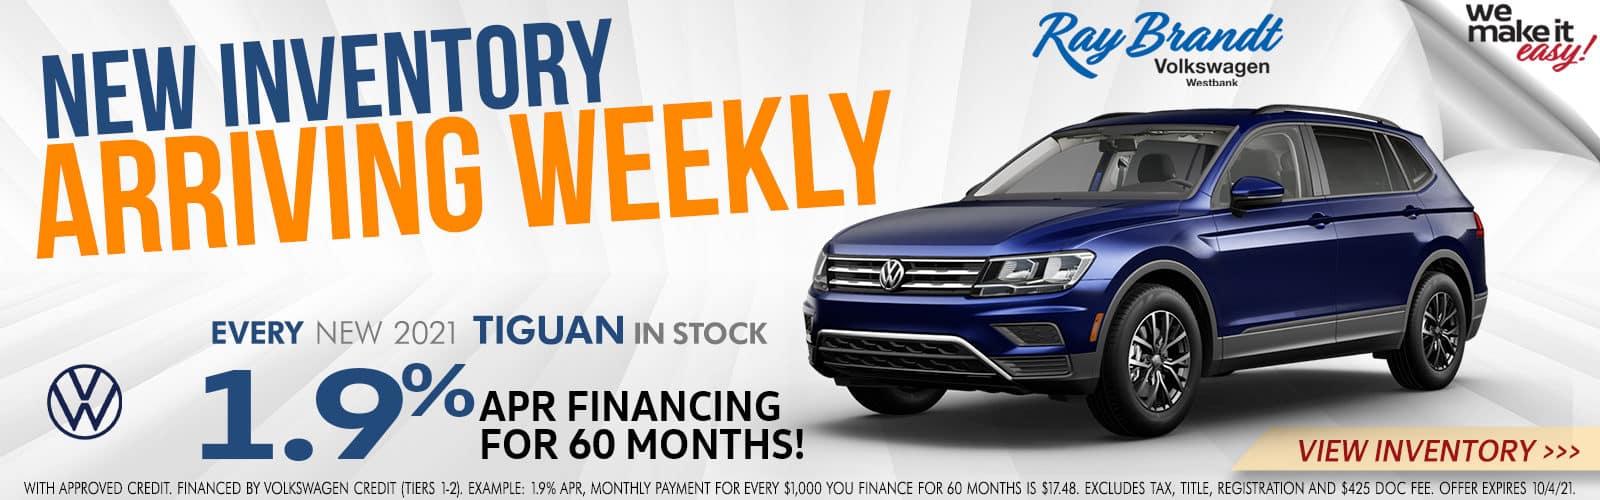 New Inventory Arriving Weekly Volkswagen Tiguan for Sale